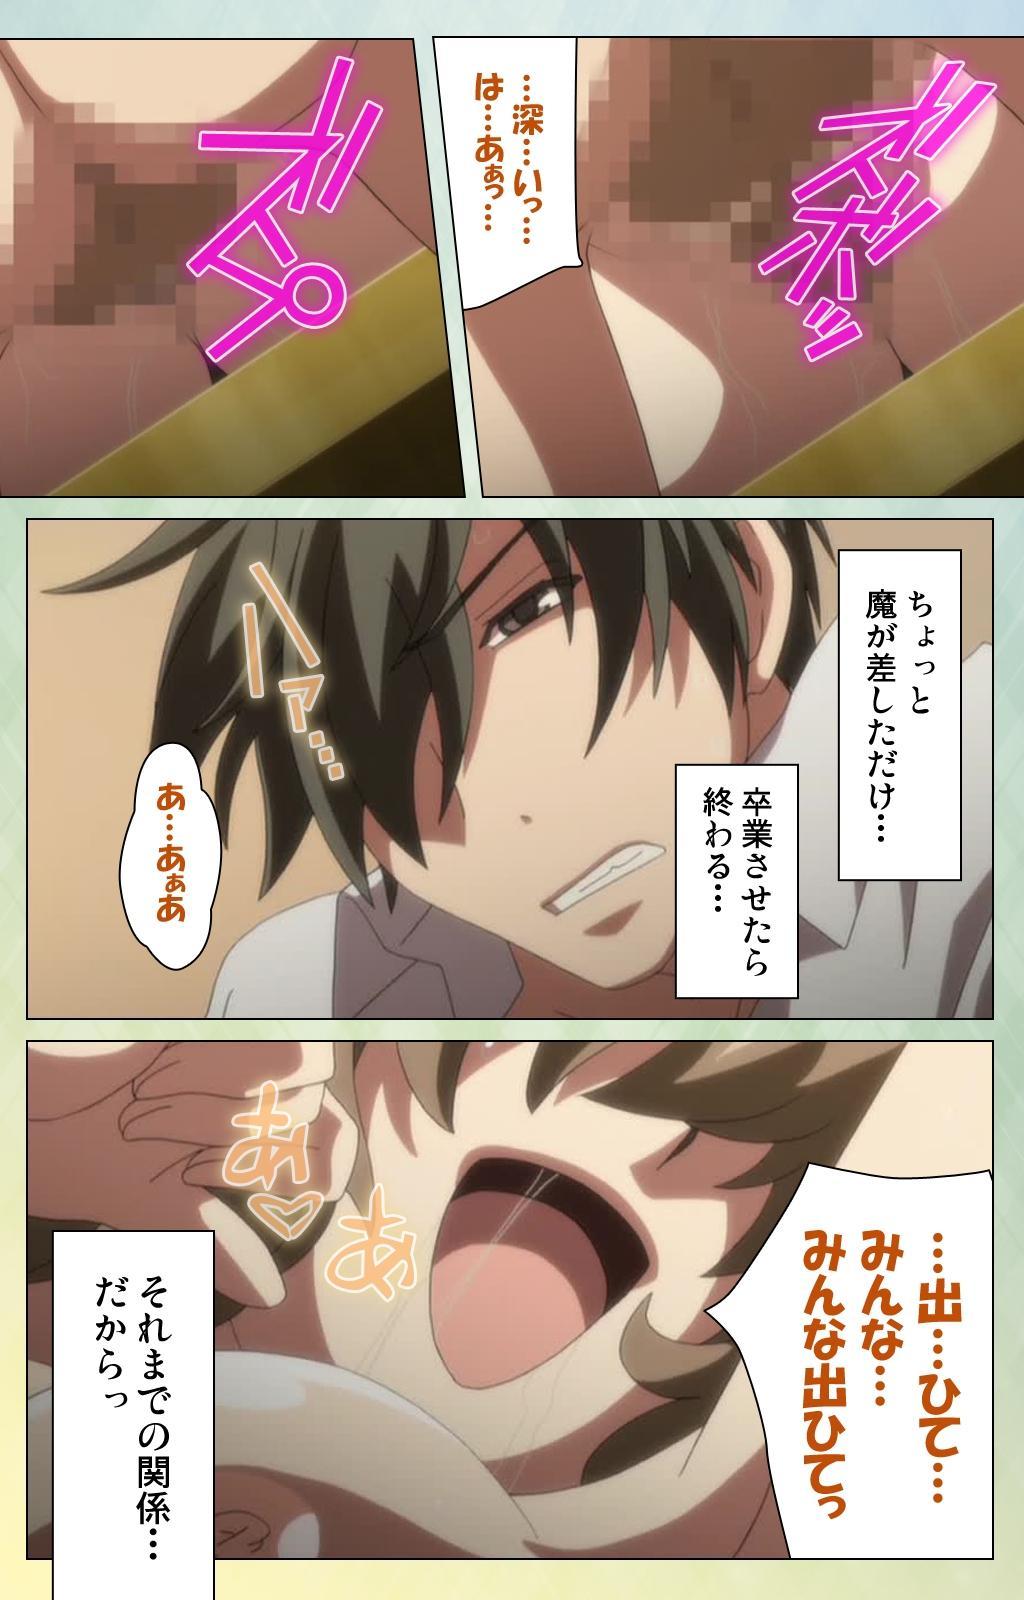 Furueru Kuchibiru fuzzy lips0 Complete Ban 31